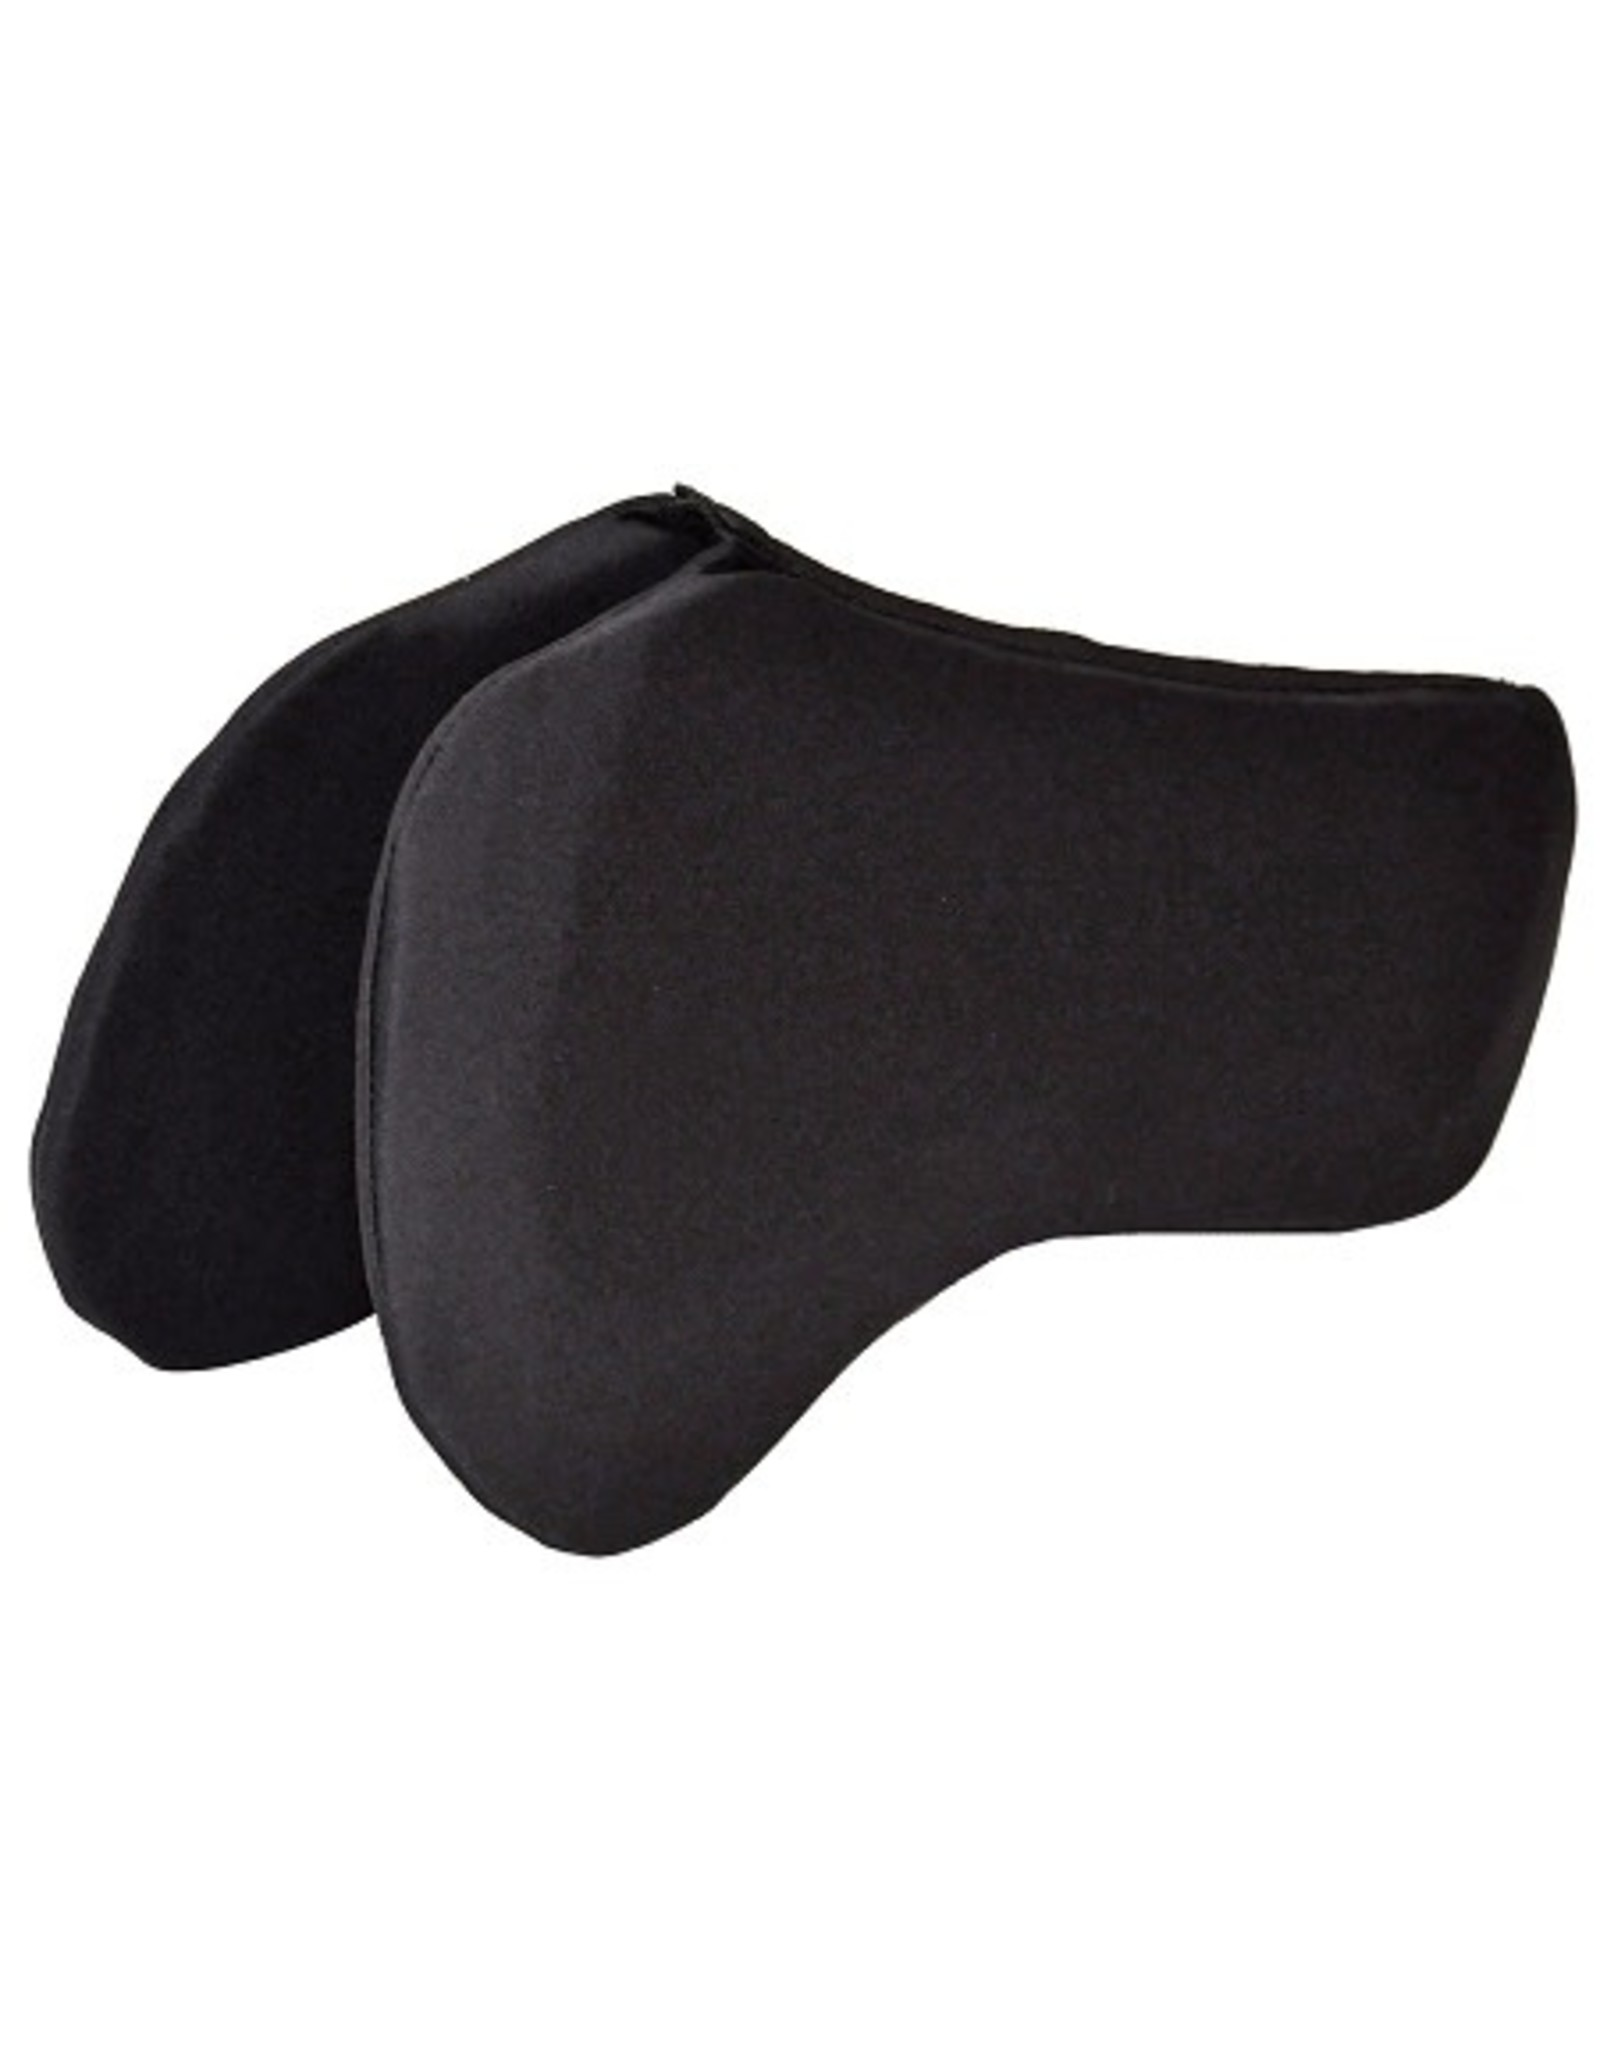 Triple E Pad Shoulder Bridging Memory Foam 15 x 18